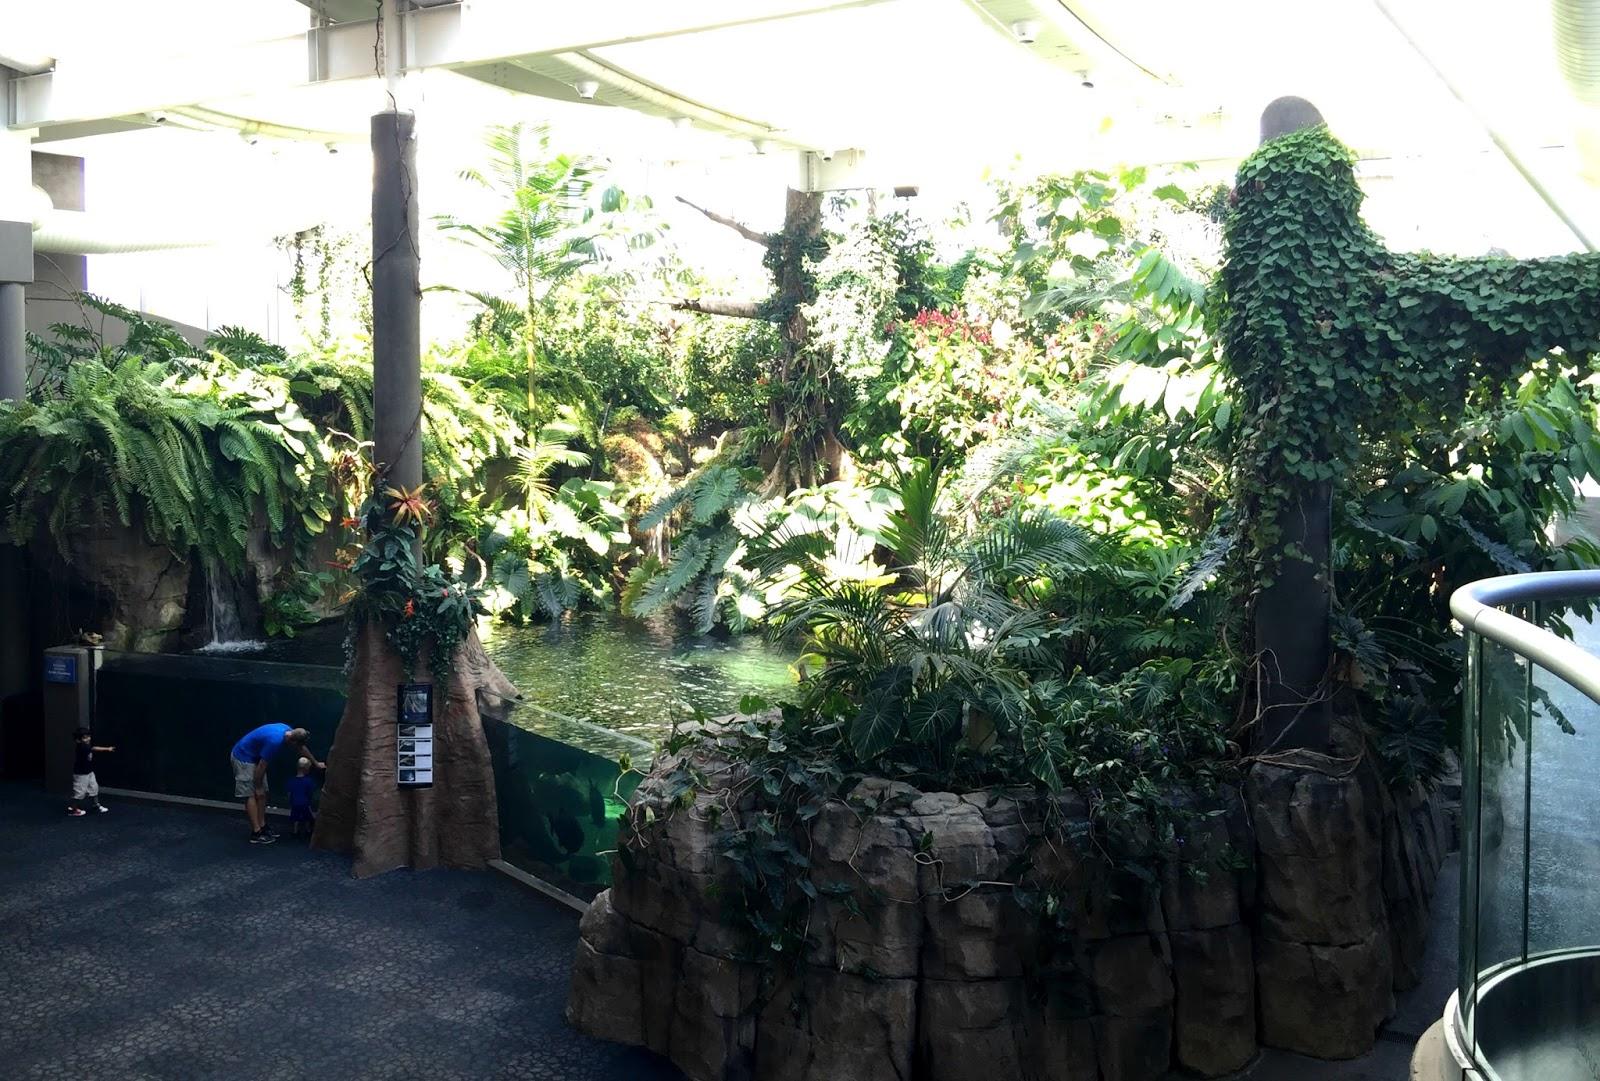 Pittsburgh Zoo & PPG Aquarium: Pittsburgh is Kidsburgh